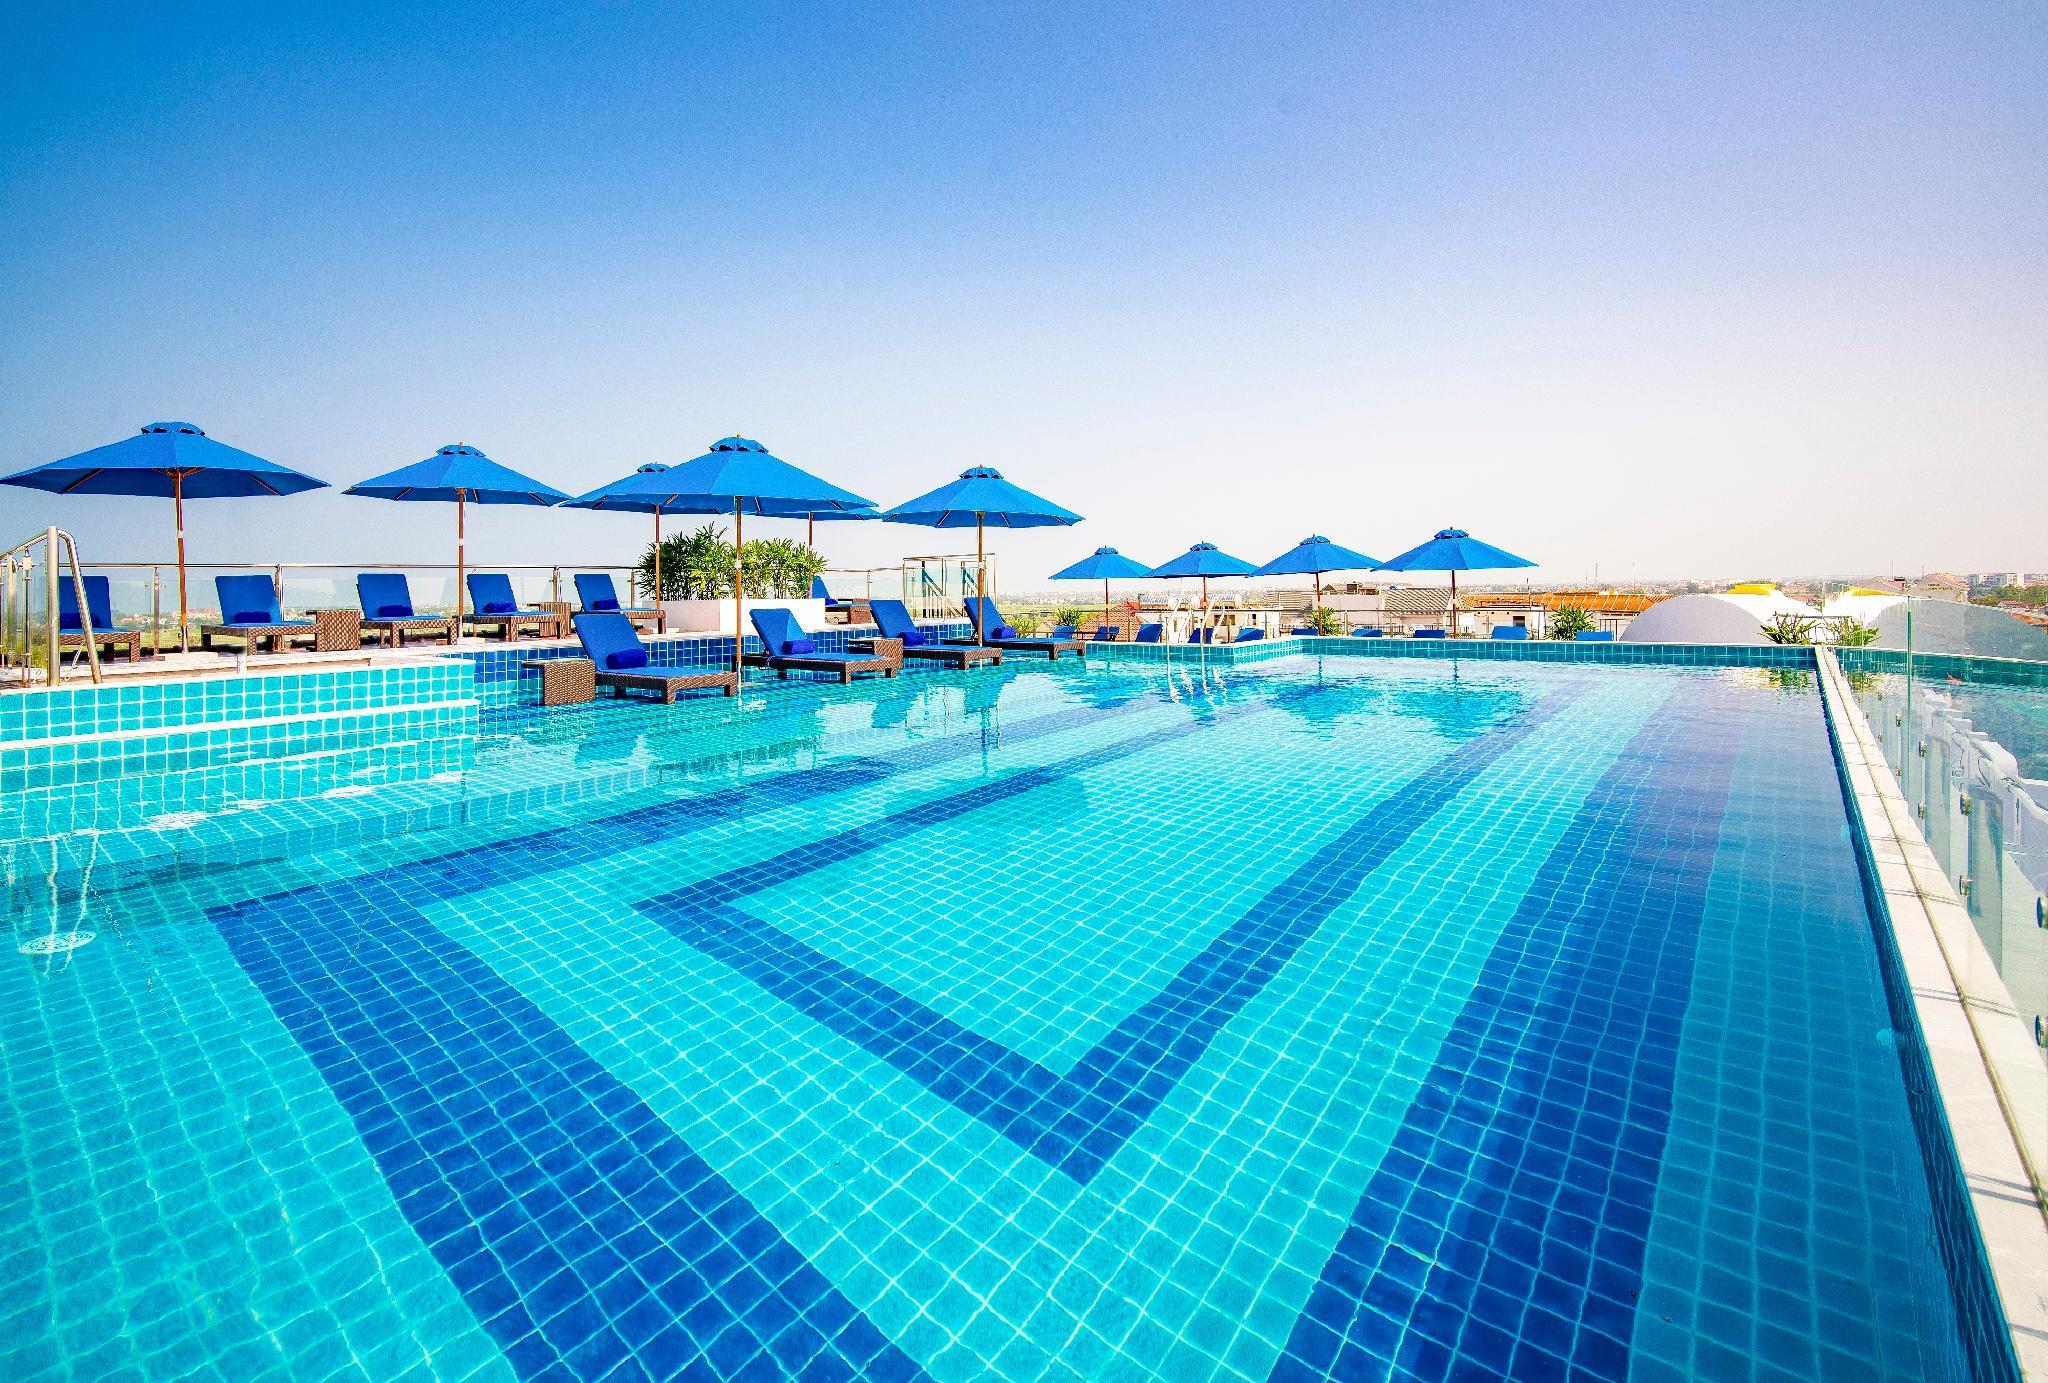 Le Pavillon Hoi An Paradise Hotel And Spa